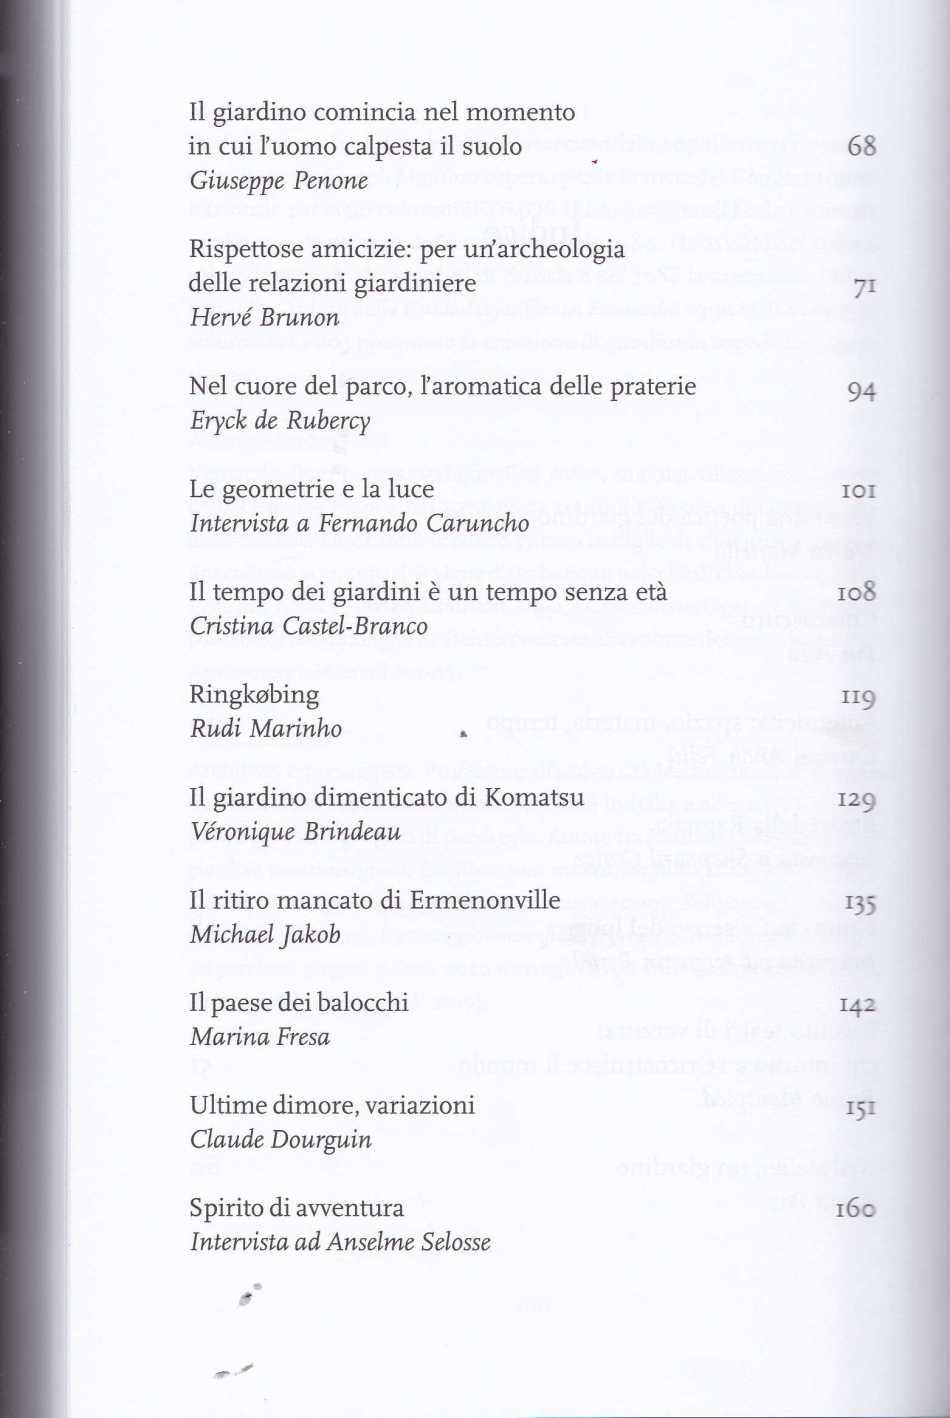 MARTELLA GIARDINO3243